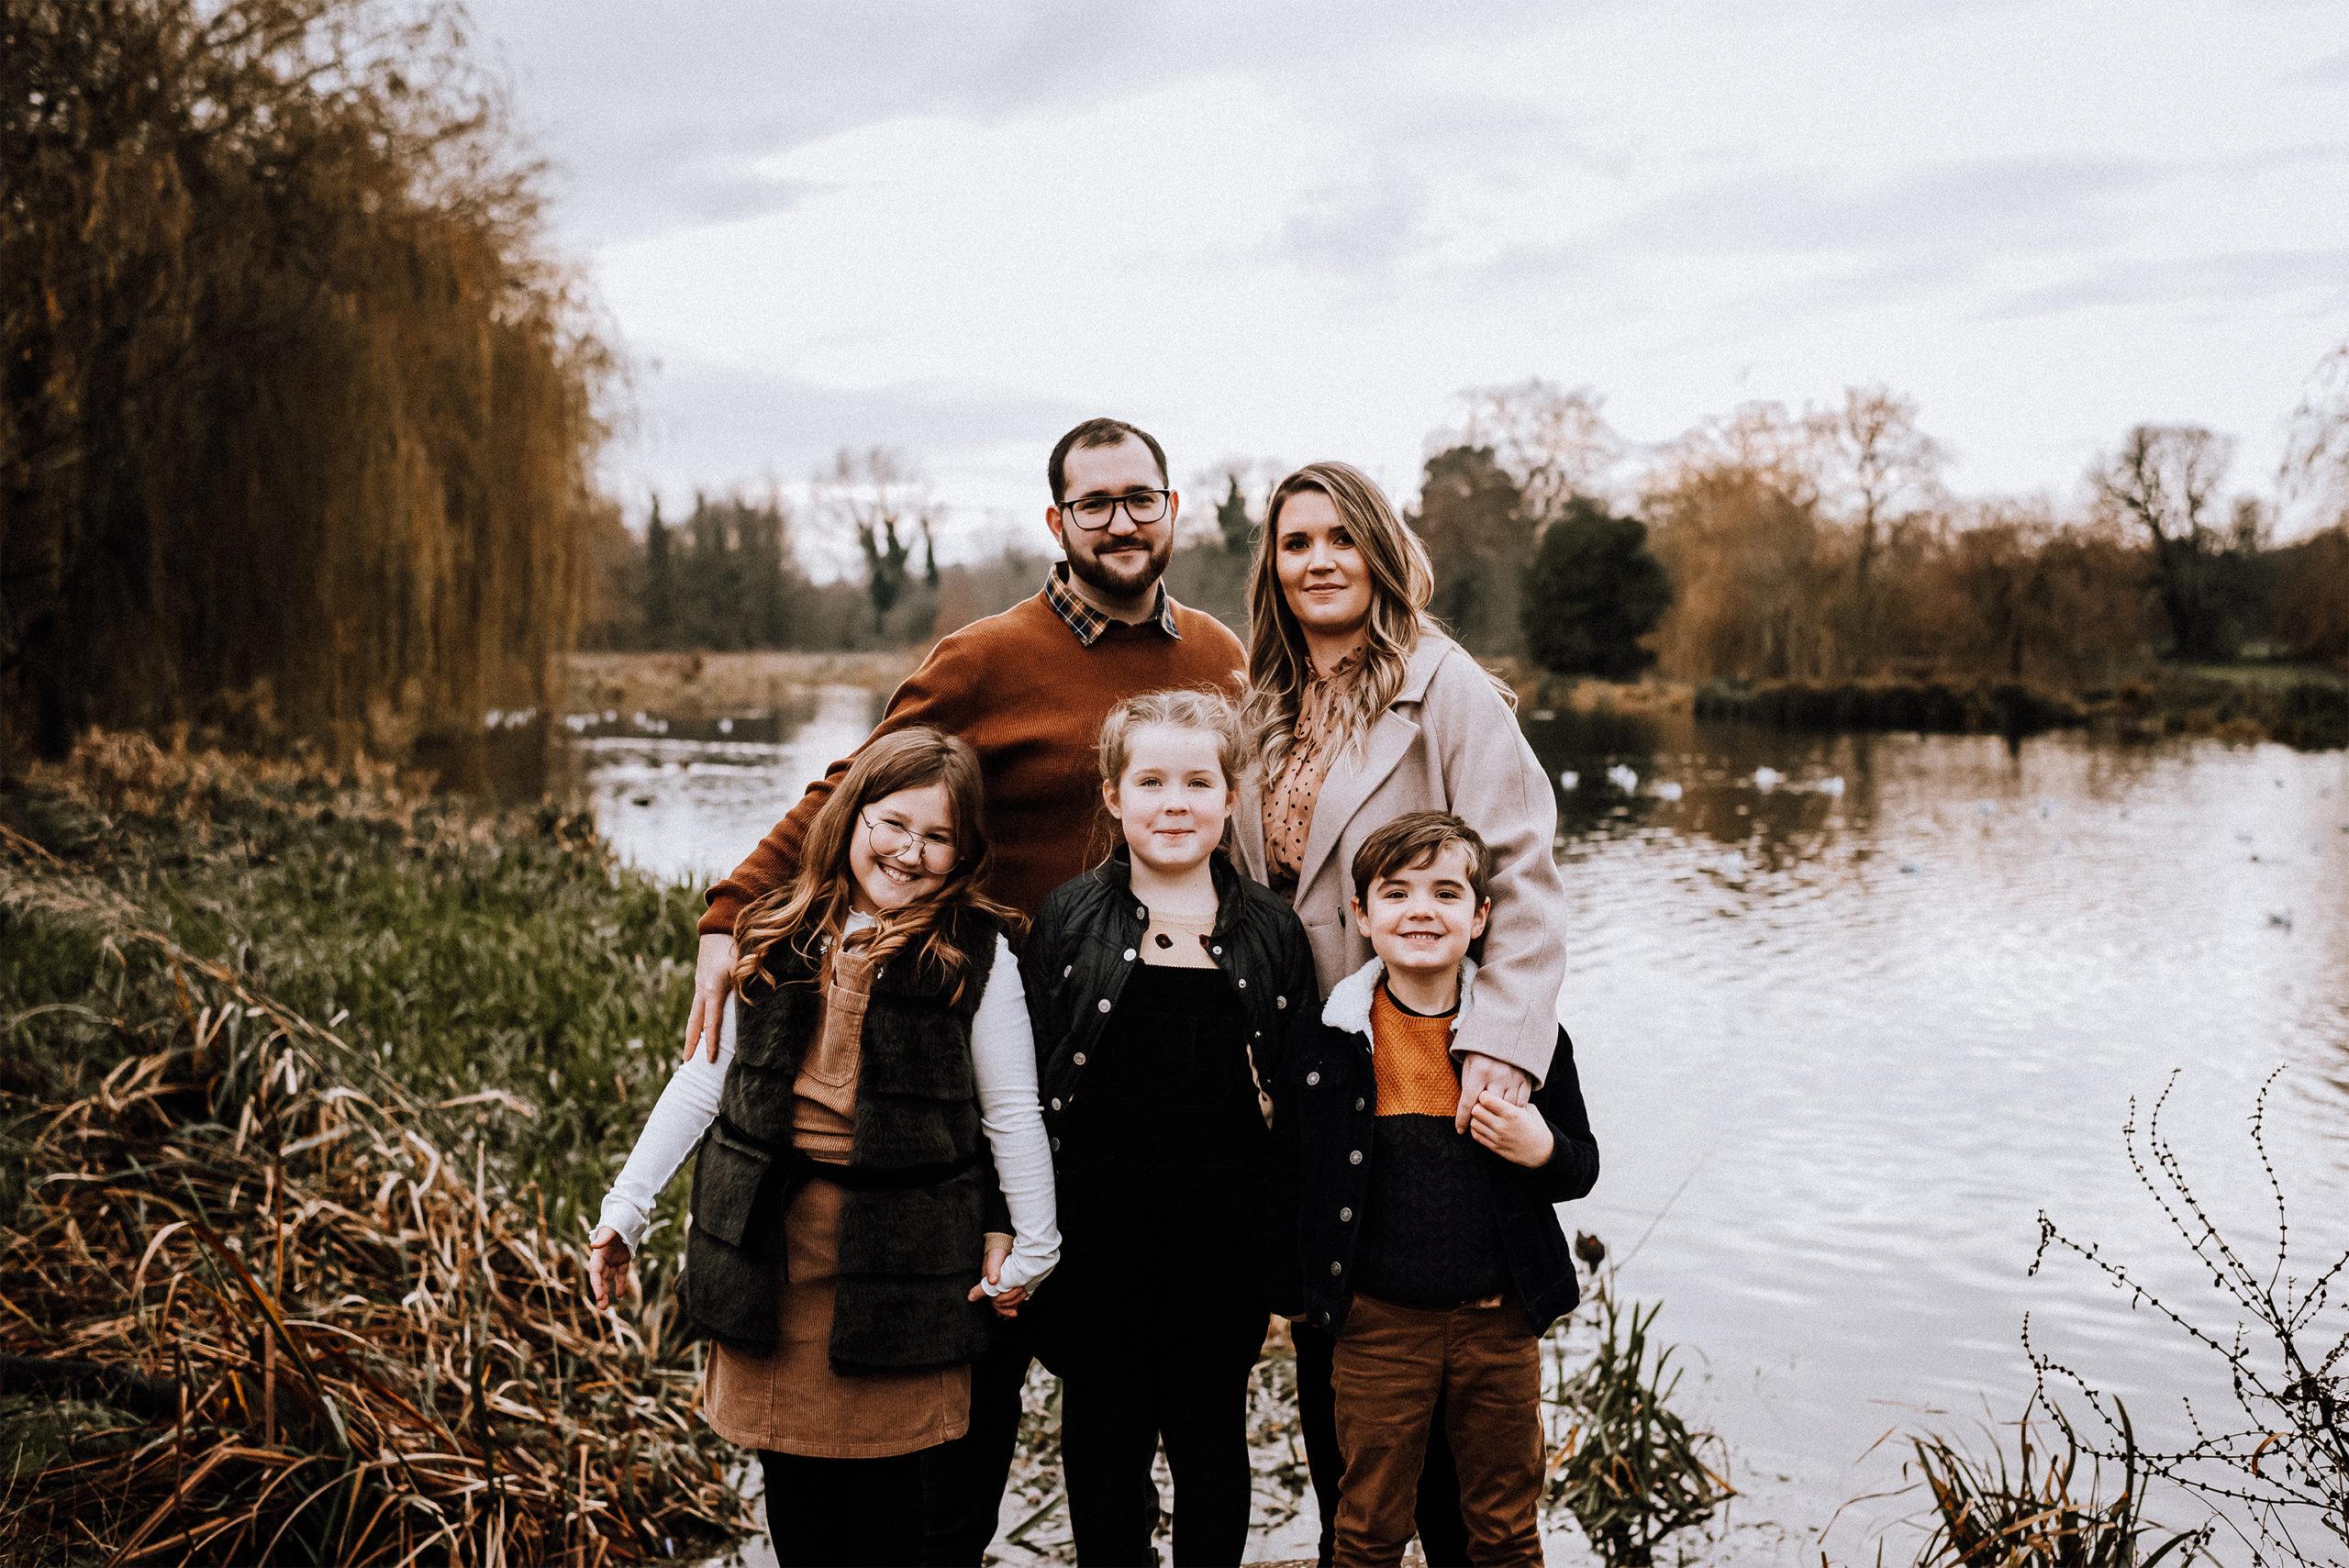 Family Photo of HAnnah Cornford. Family Photographer based in Rochester, Kent.